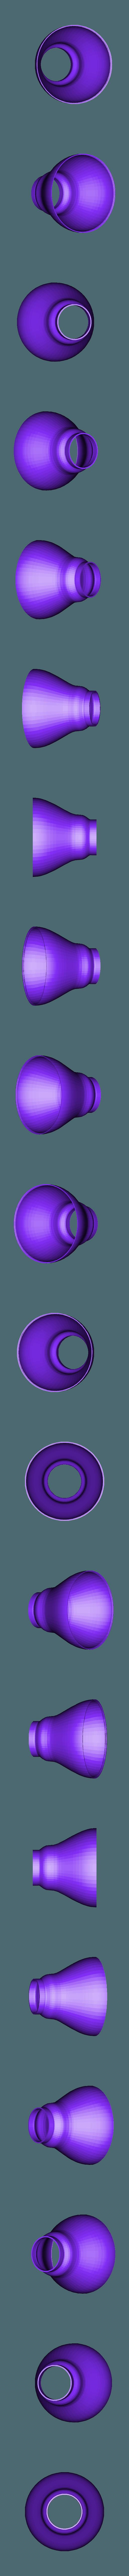 Light_Bulb_Lamp_V3.1_A.stl Download free STL file Light_Bulb Lamp V3.1 • 3D printable object, Pipapelaa